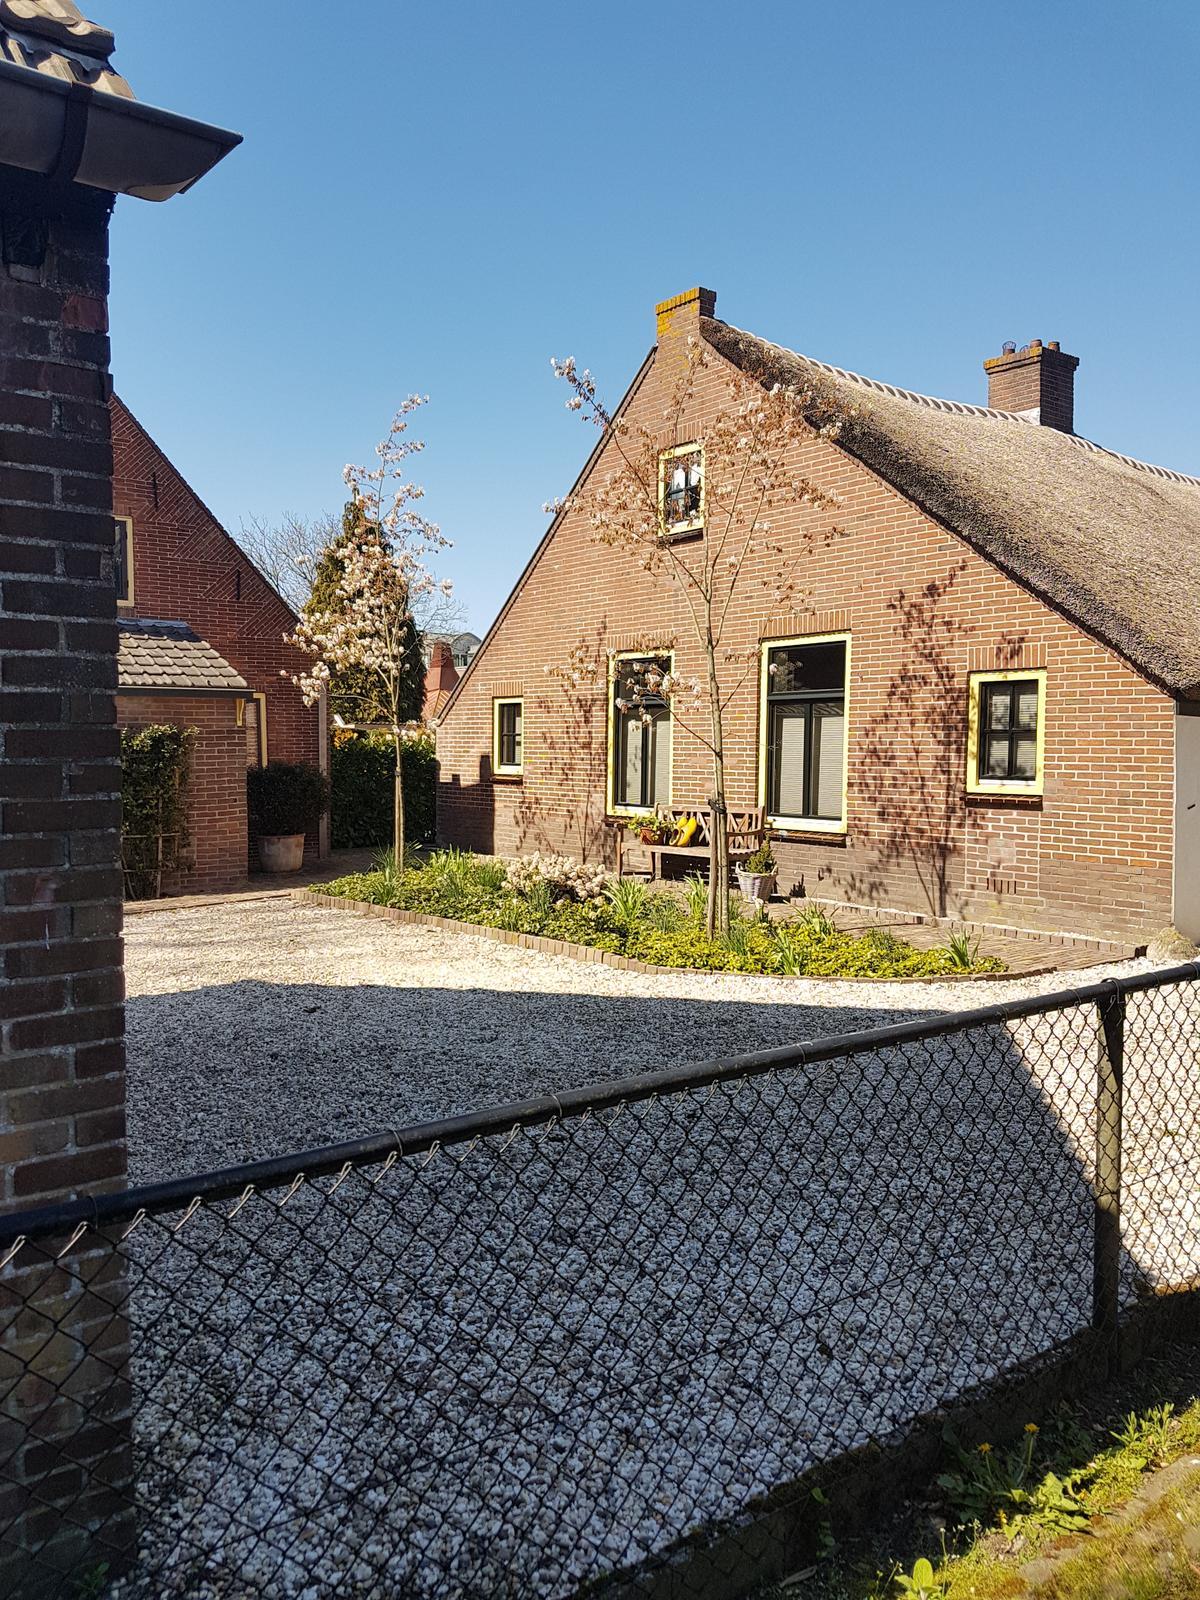 Holandsko - Obrázek č. 21